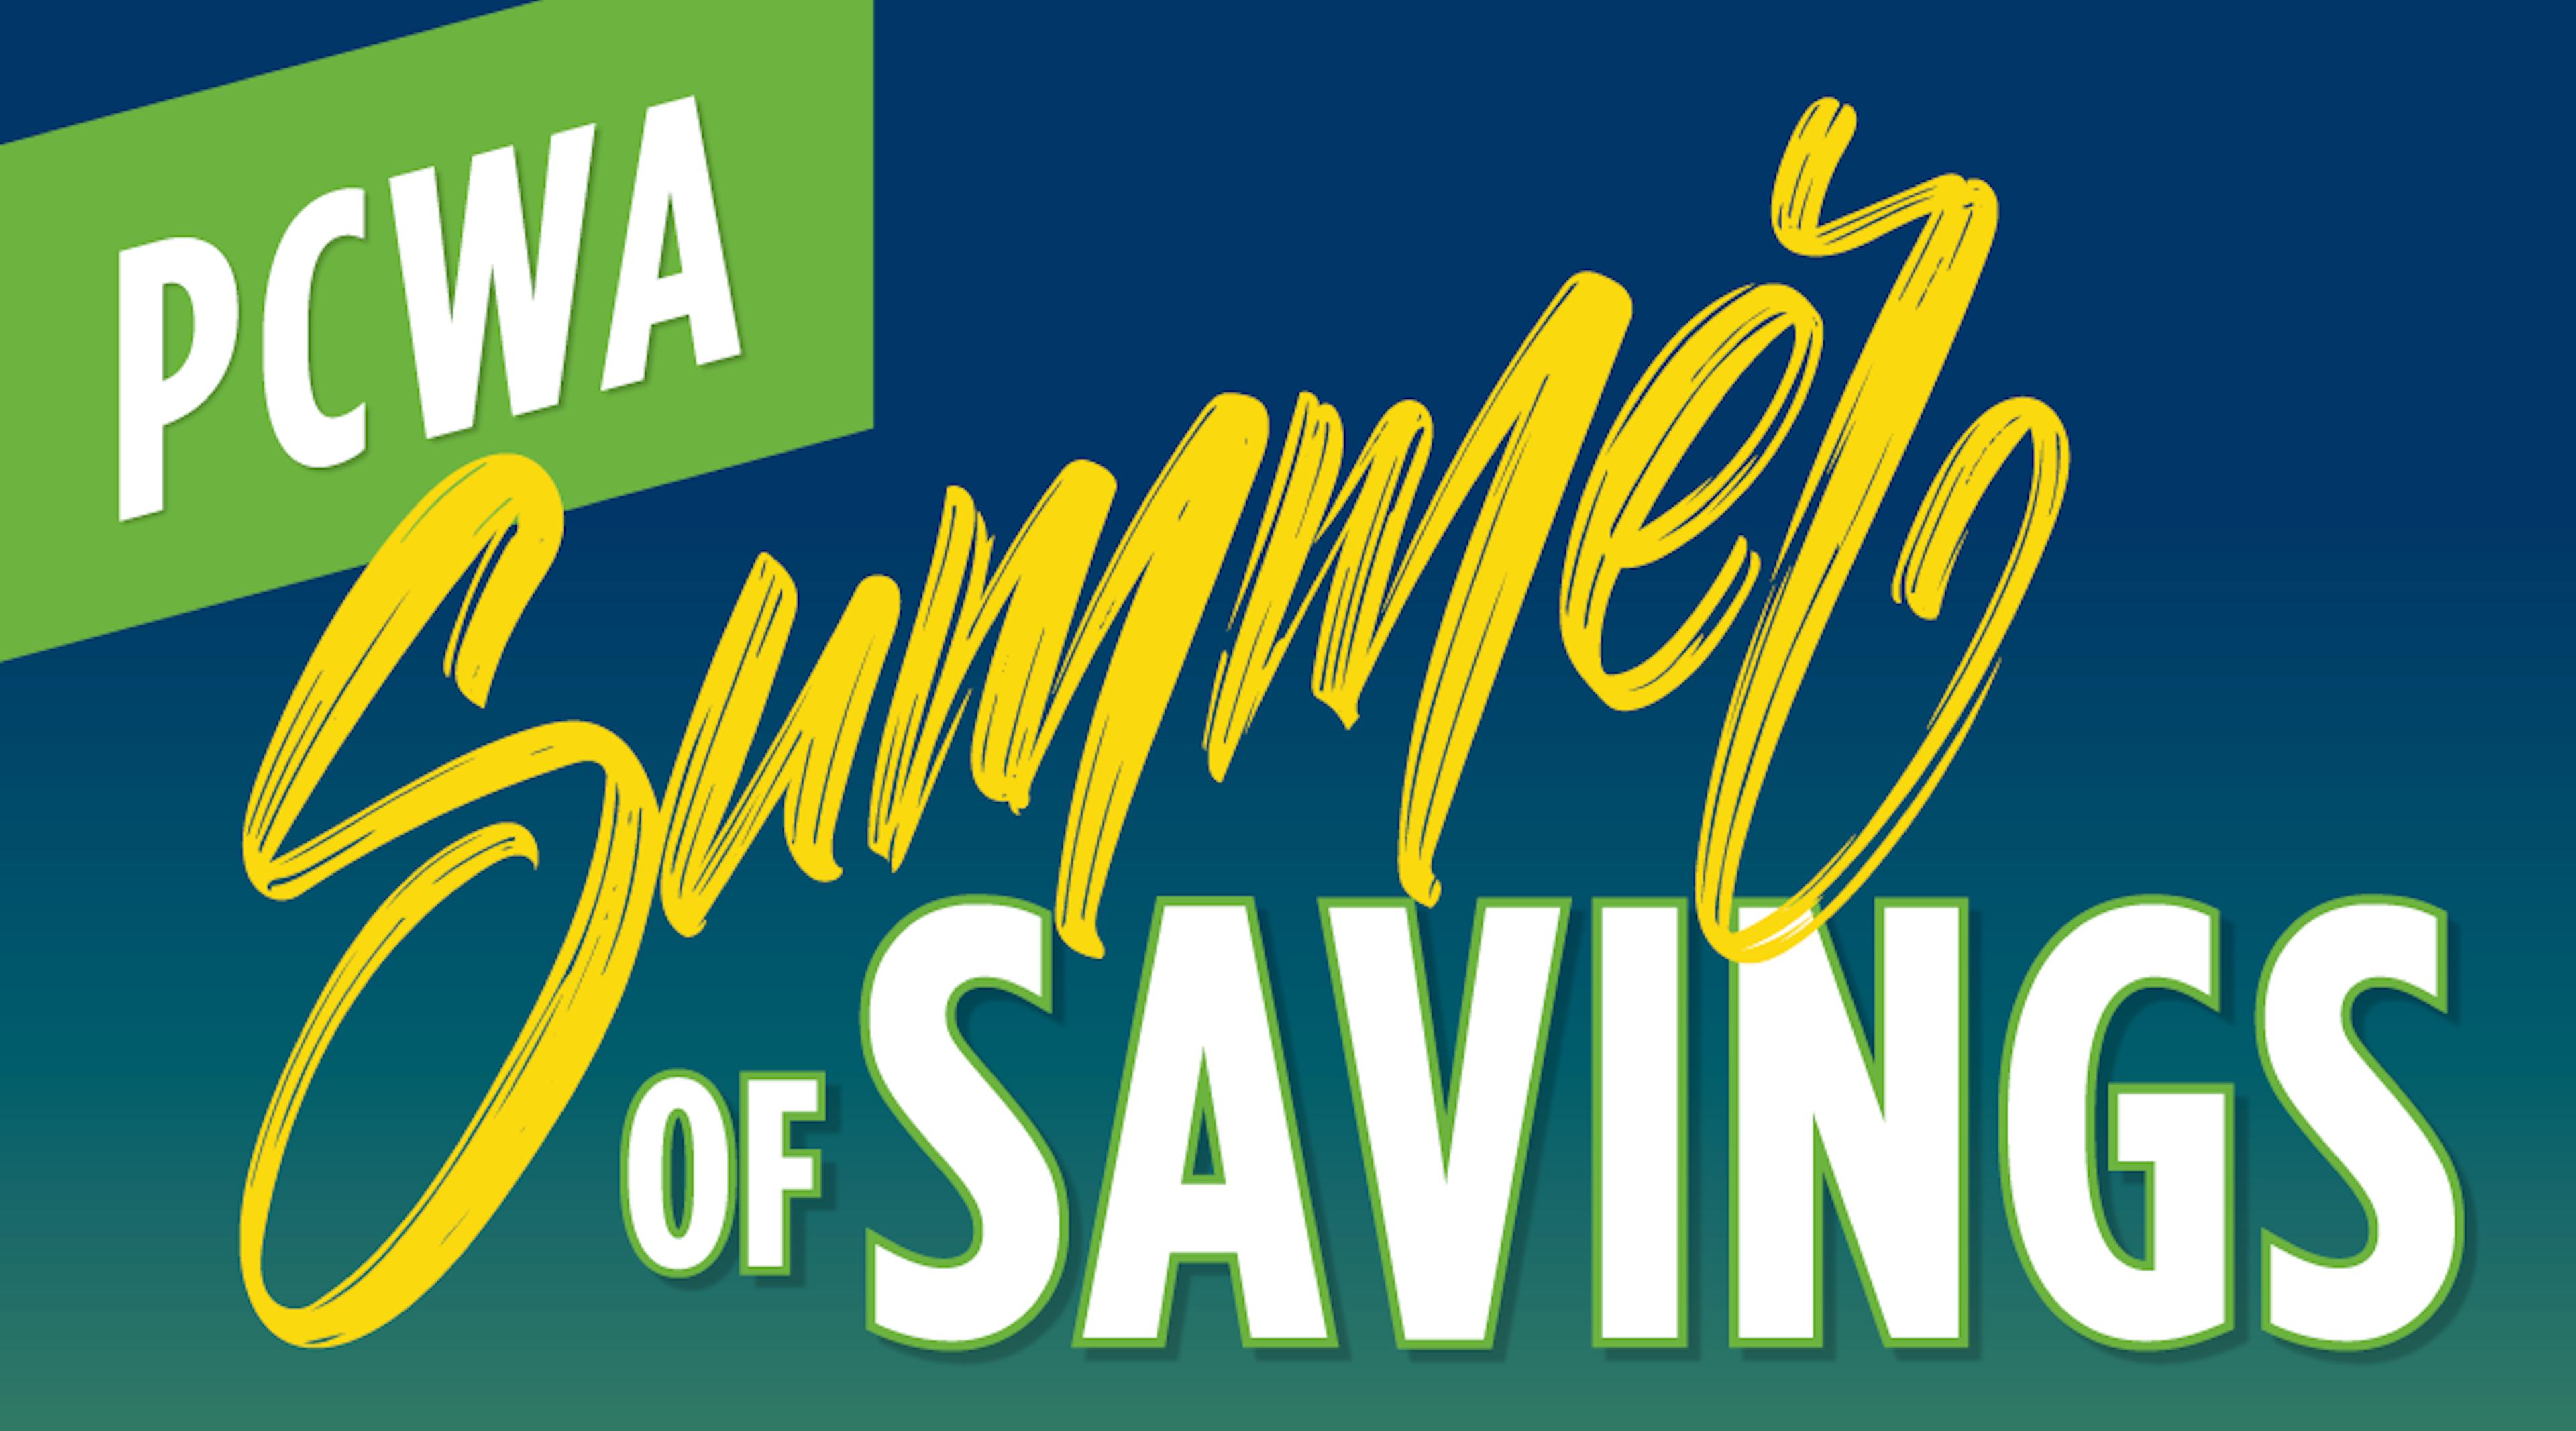 PCWA Summer of Savings banner